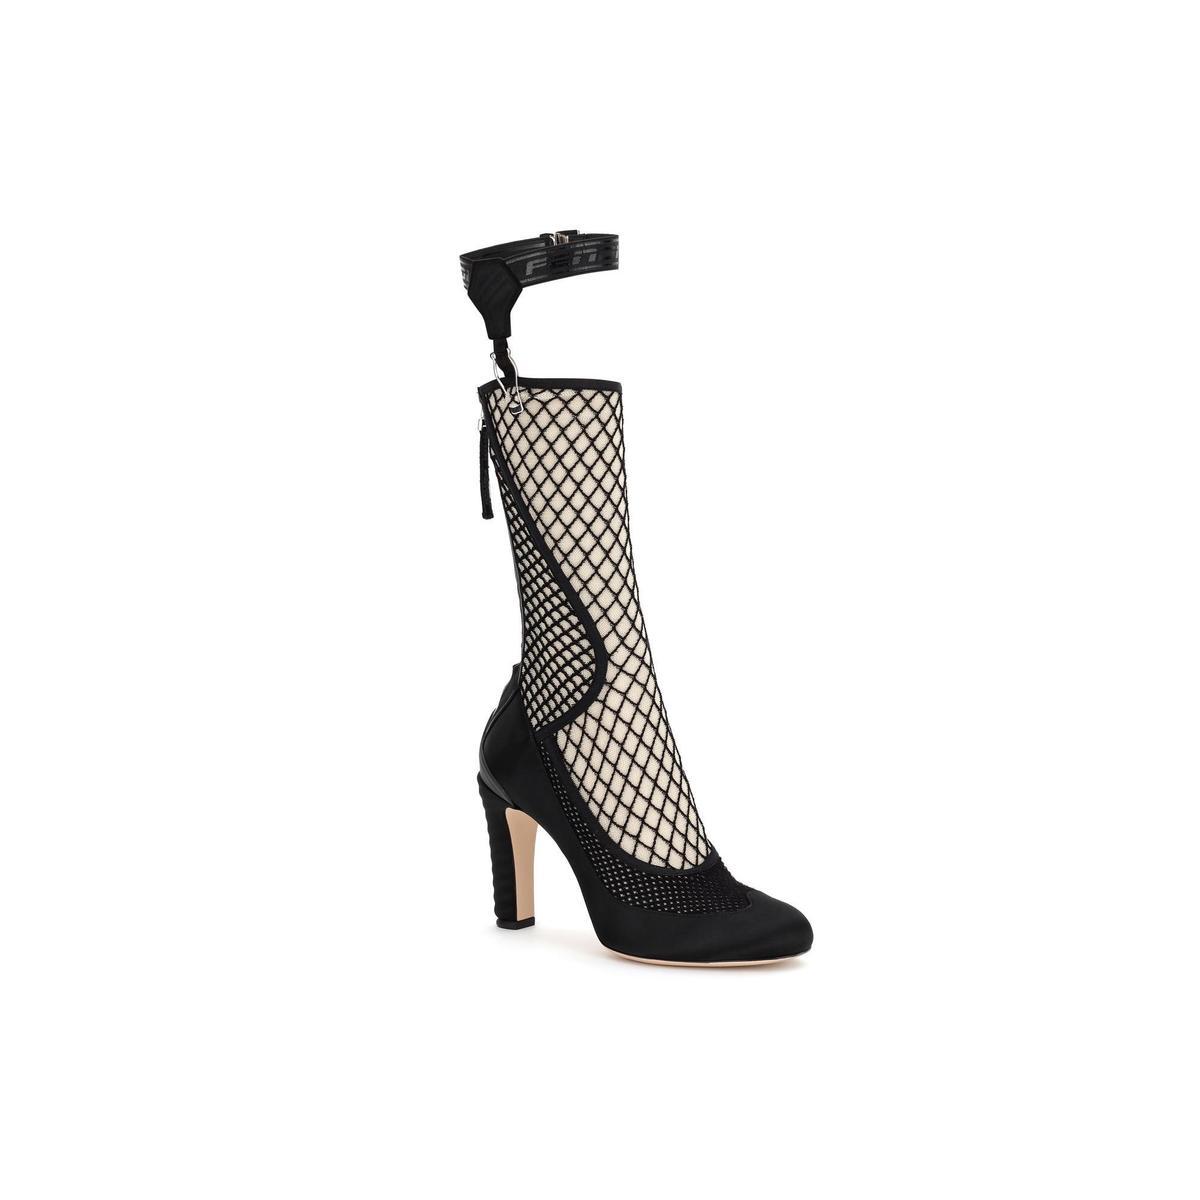 .Promenade網眼設計高跟鞋。NT$48,500(FENDI提供)